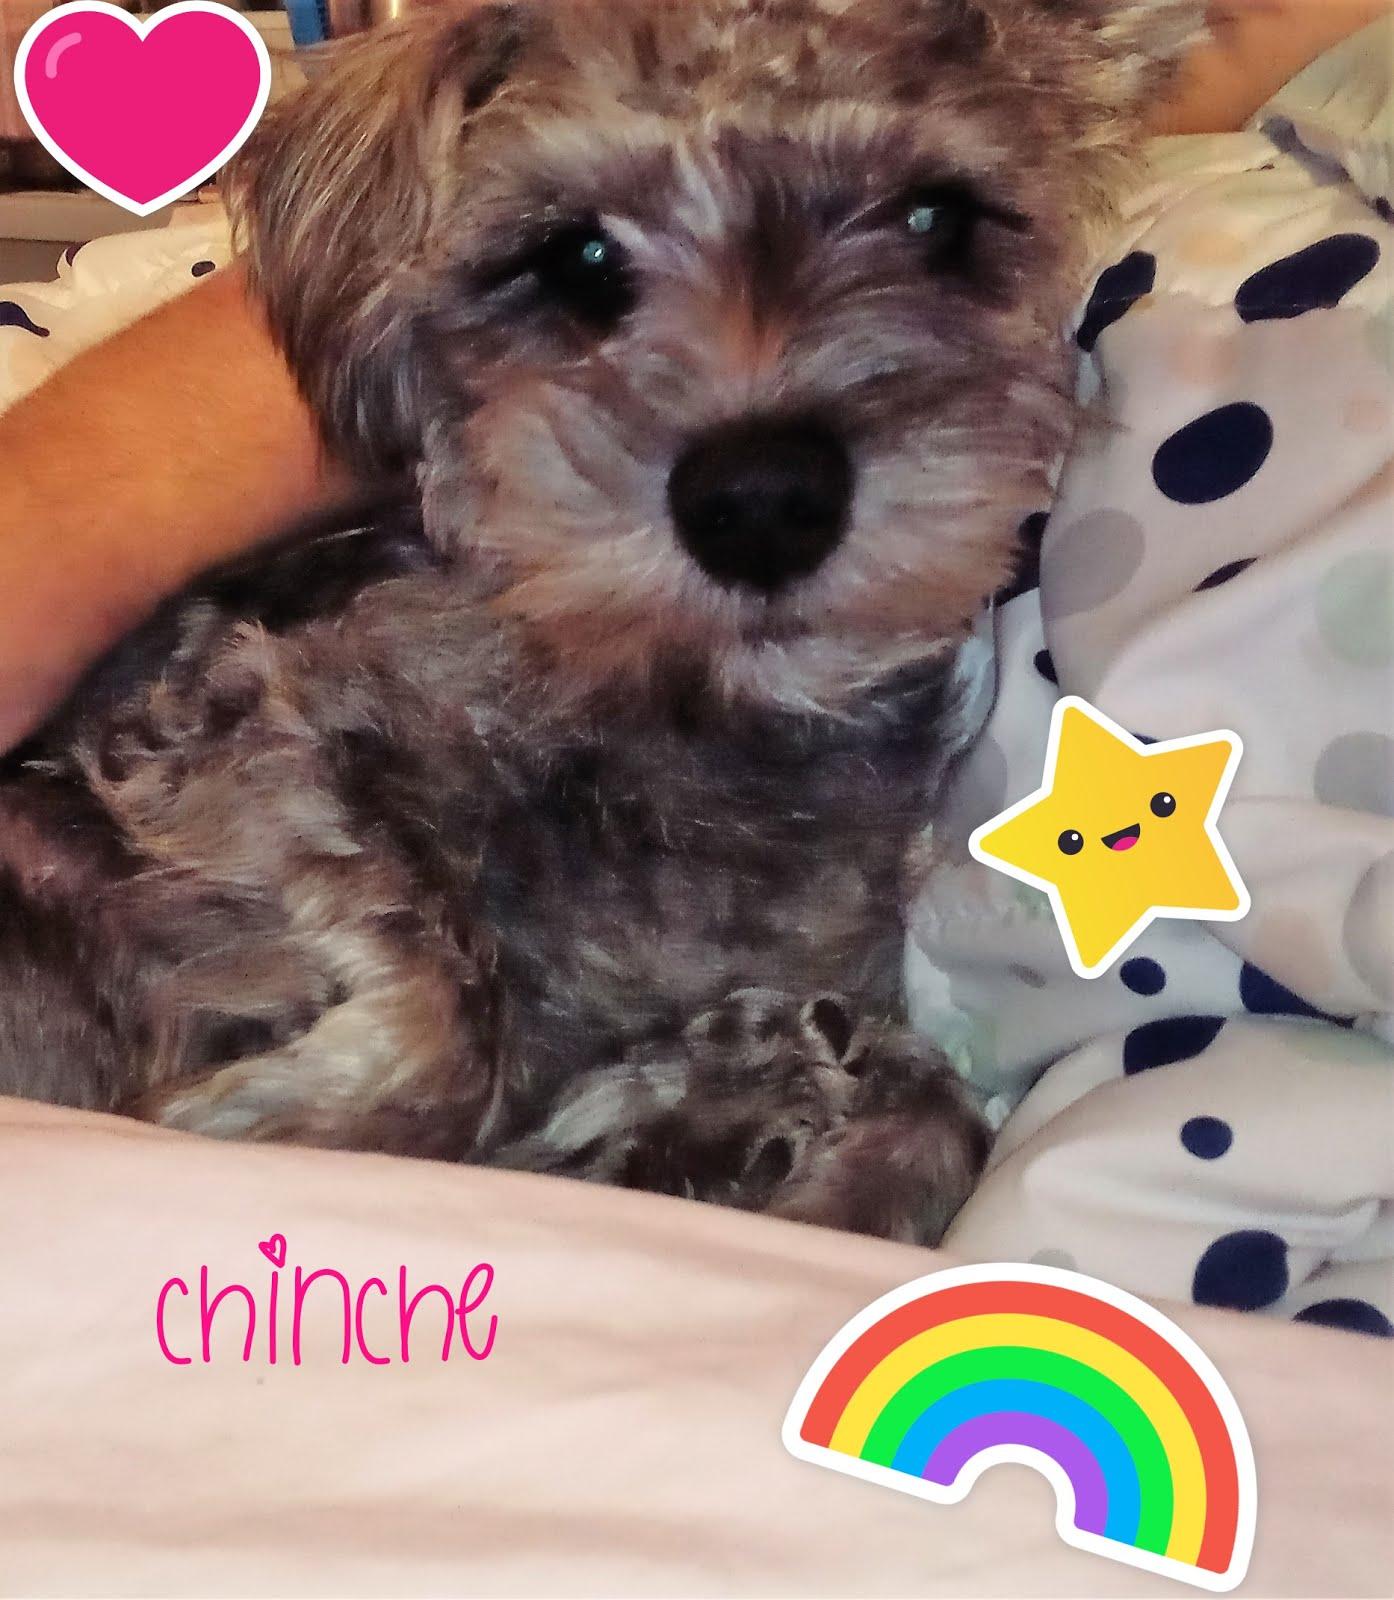 My Baby Dog Chinche